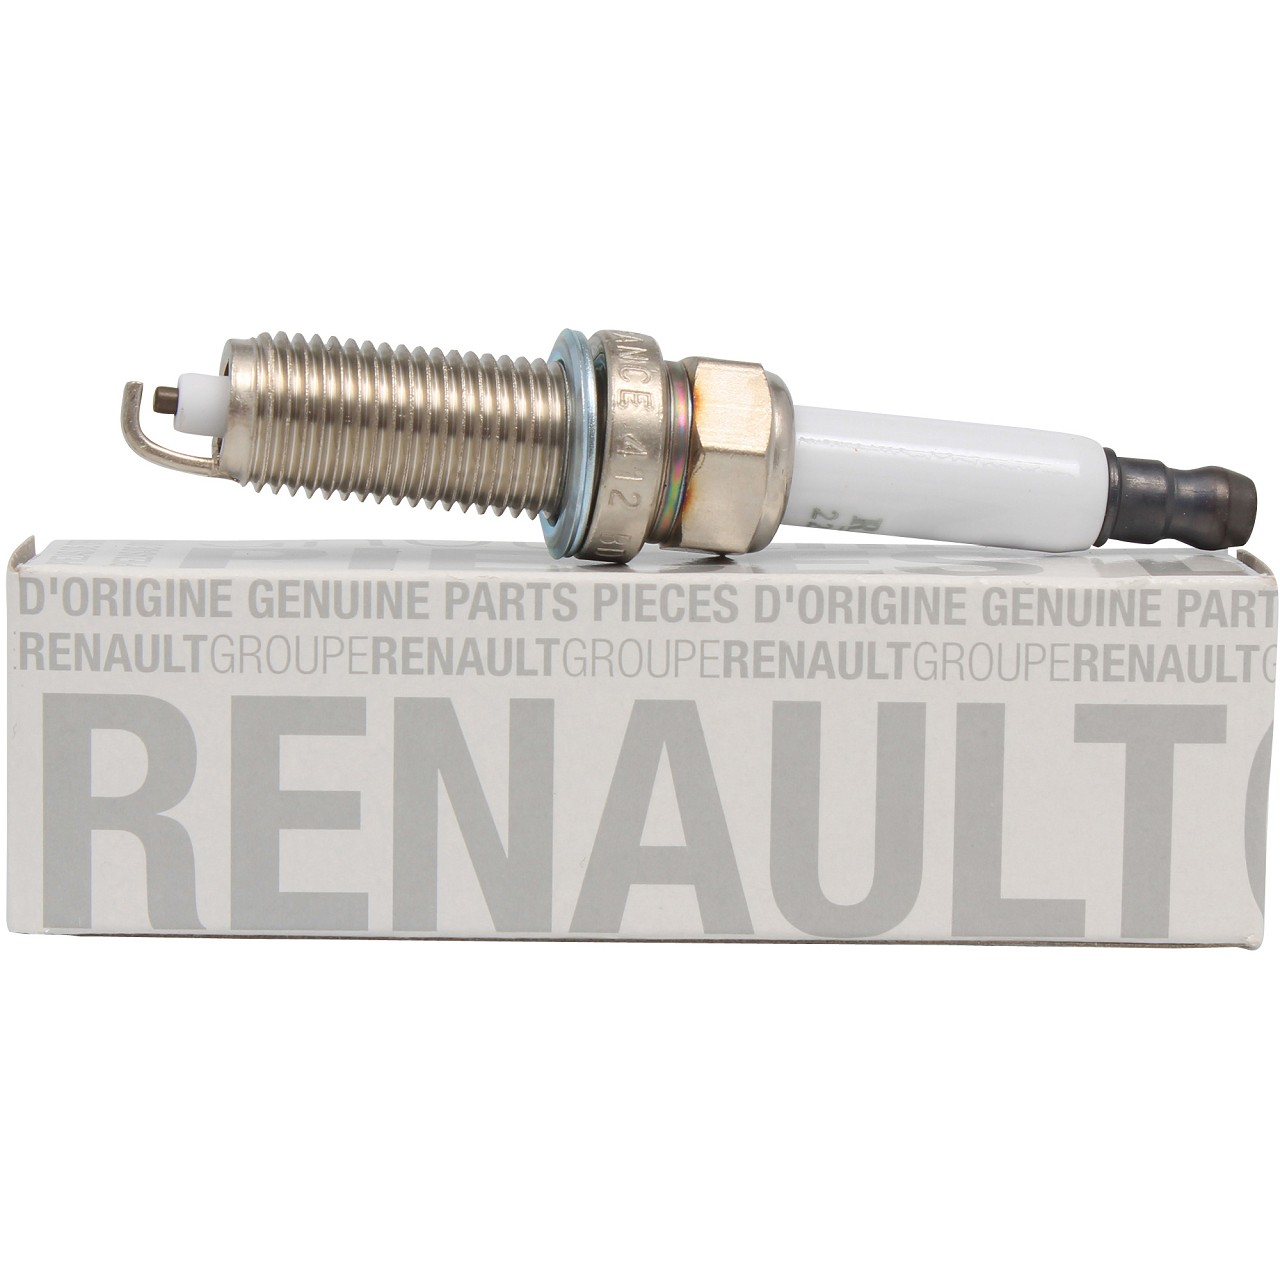 ORIGINAL Renault Zündkerze (1 Stück) Clio Modus Thalia Twingo 1.2 224018760R